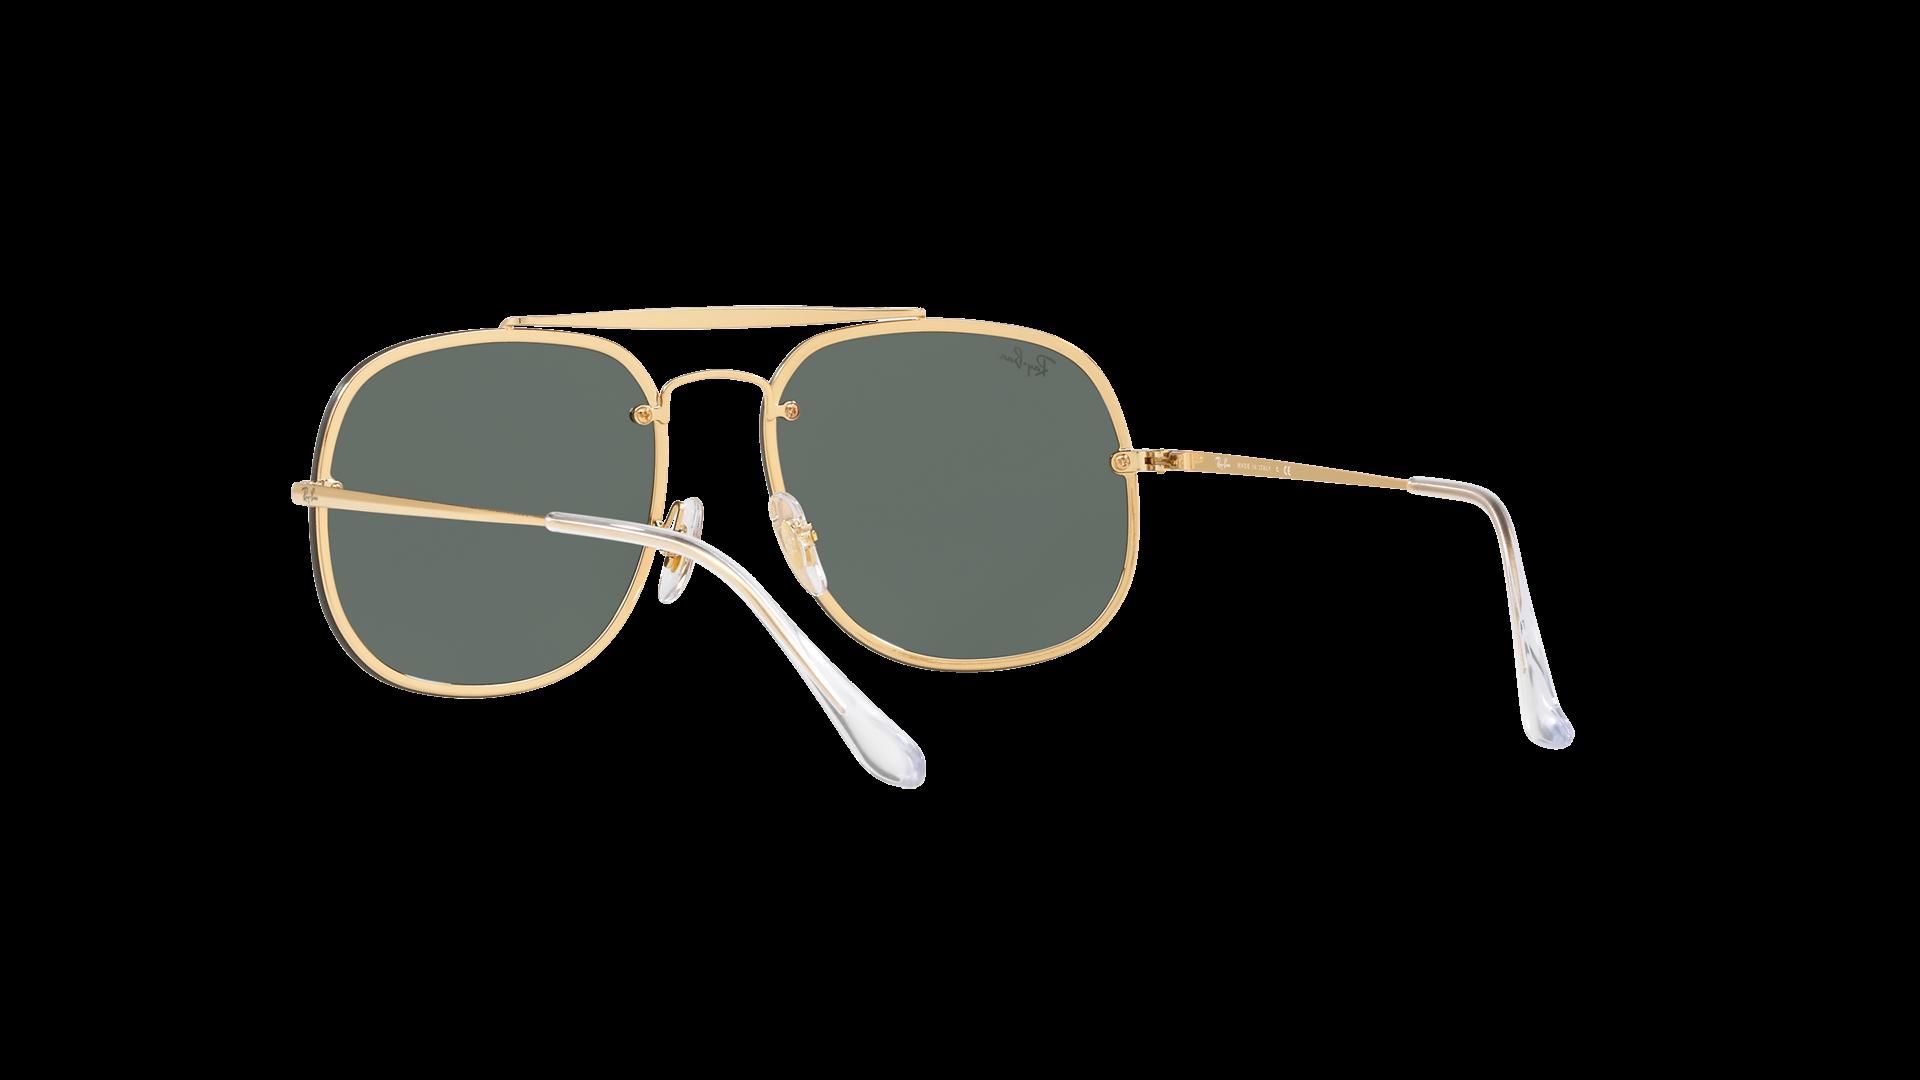 7a5dd315b53 Sunglasses Ray-Ban General Blaze Gold RB3583N 9050 71 58-16 Large